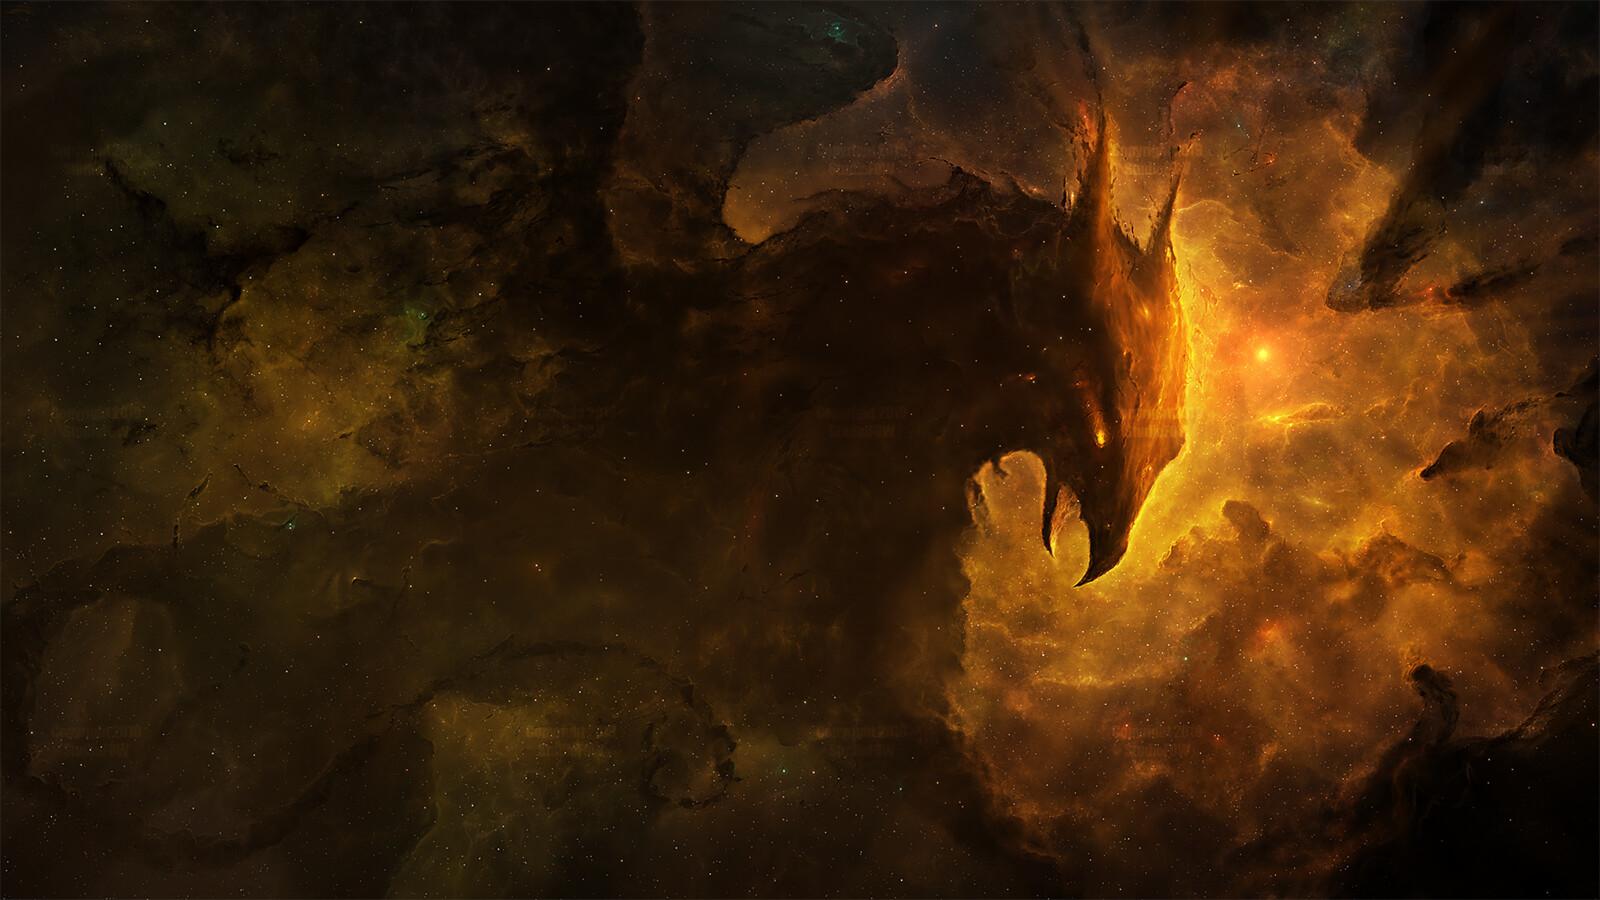 Griffin Nebula